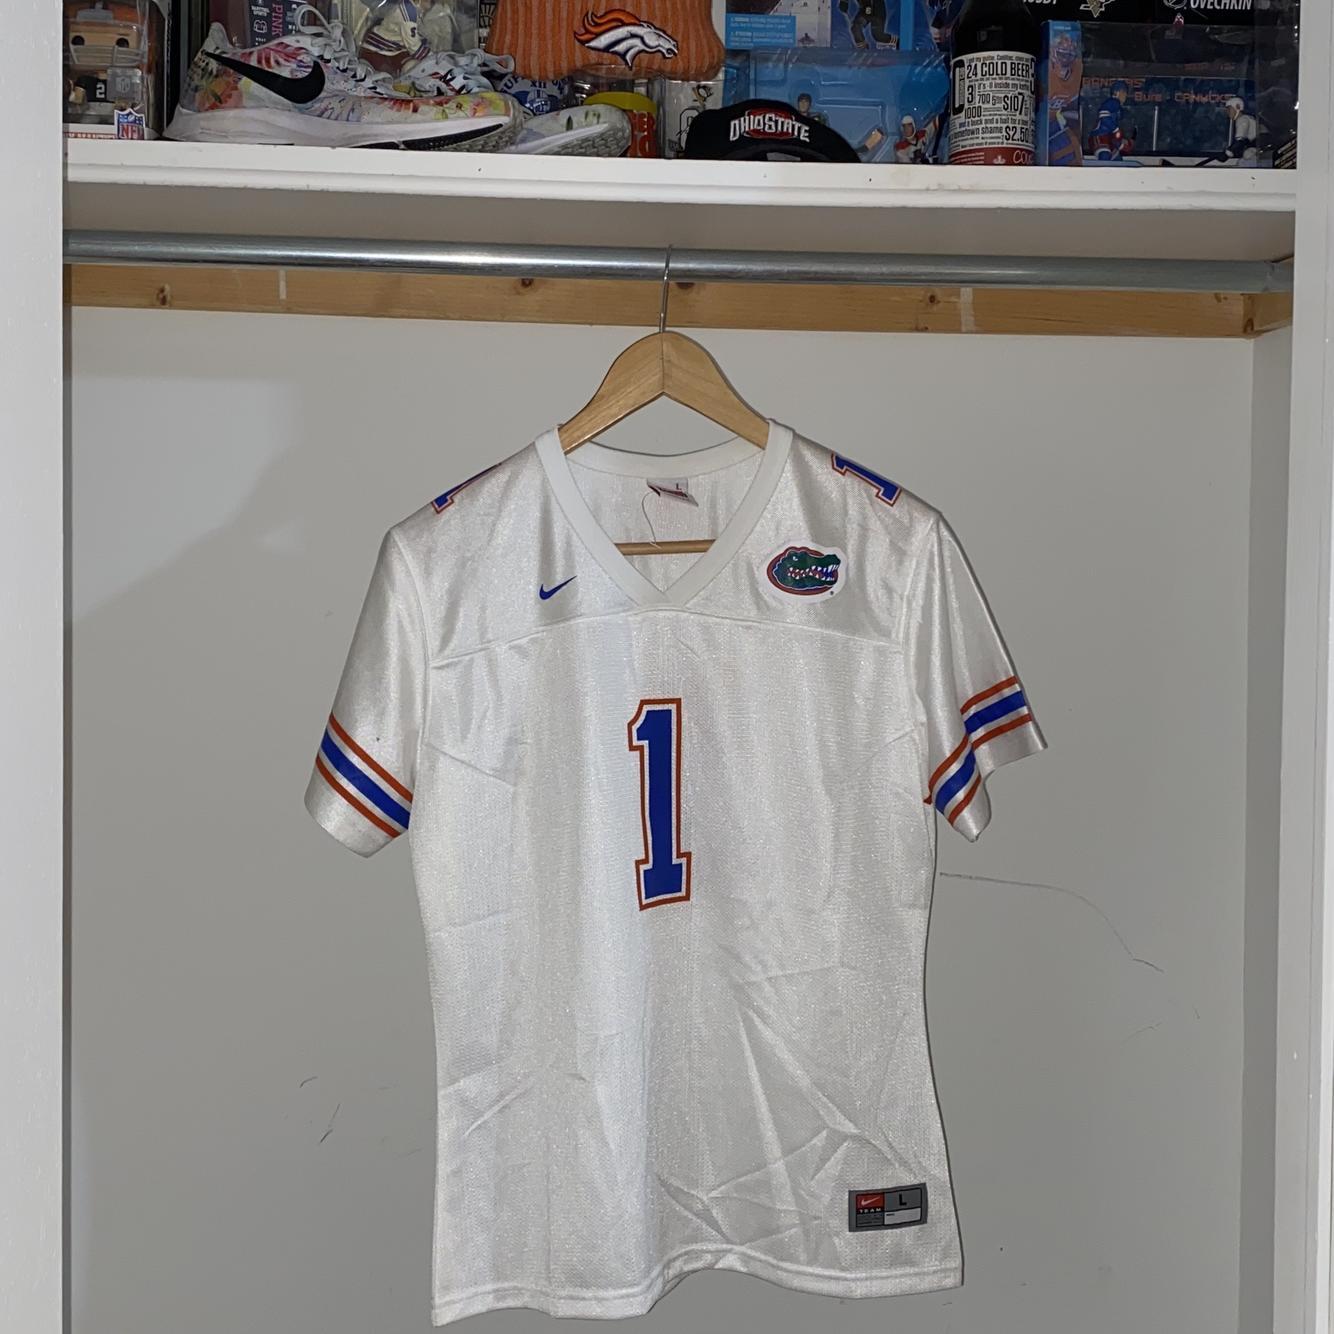 Florida Gators Authentic Nike NCAA SEC Jersey - White - Youth 12-14 Large